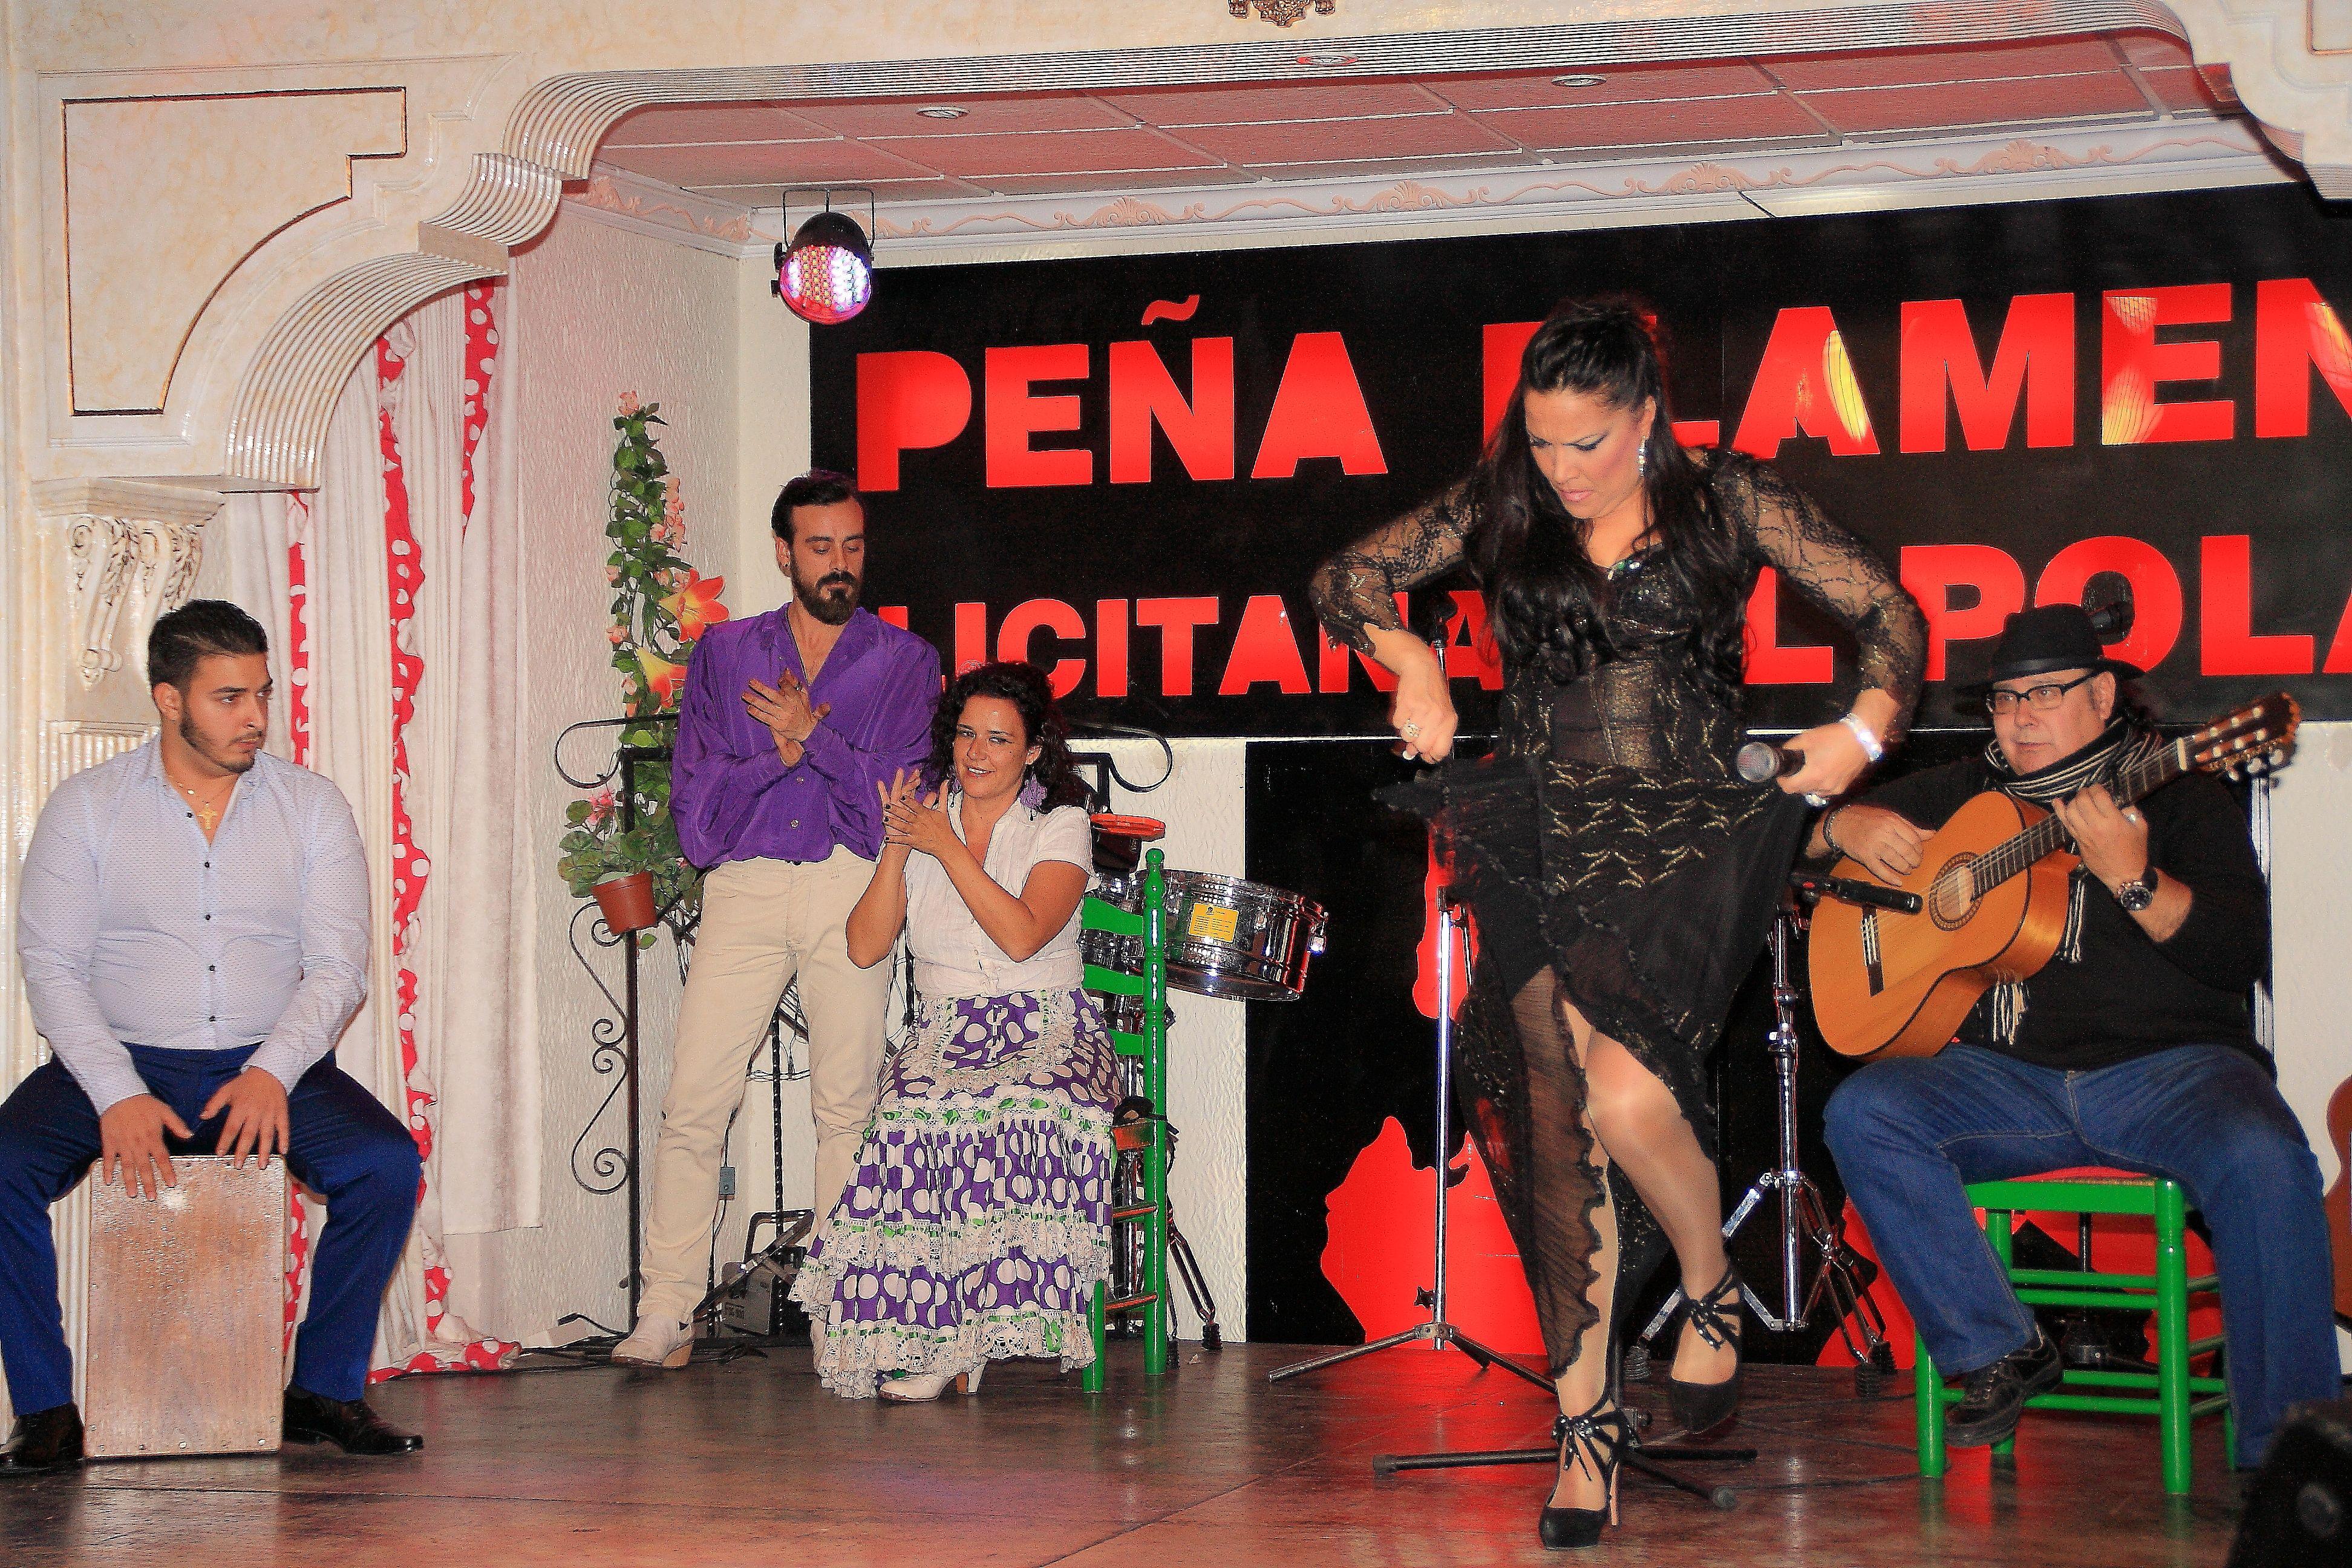 tablao flamenco santa pola